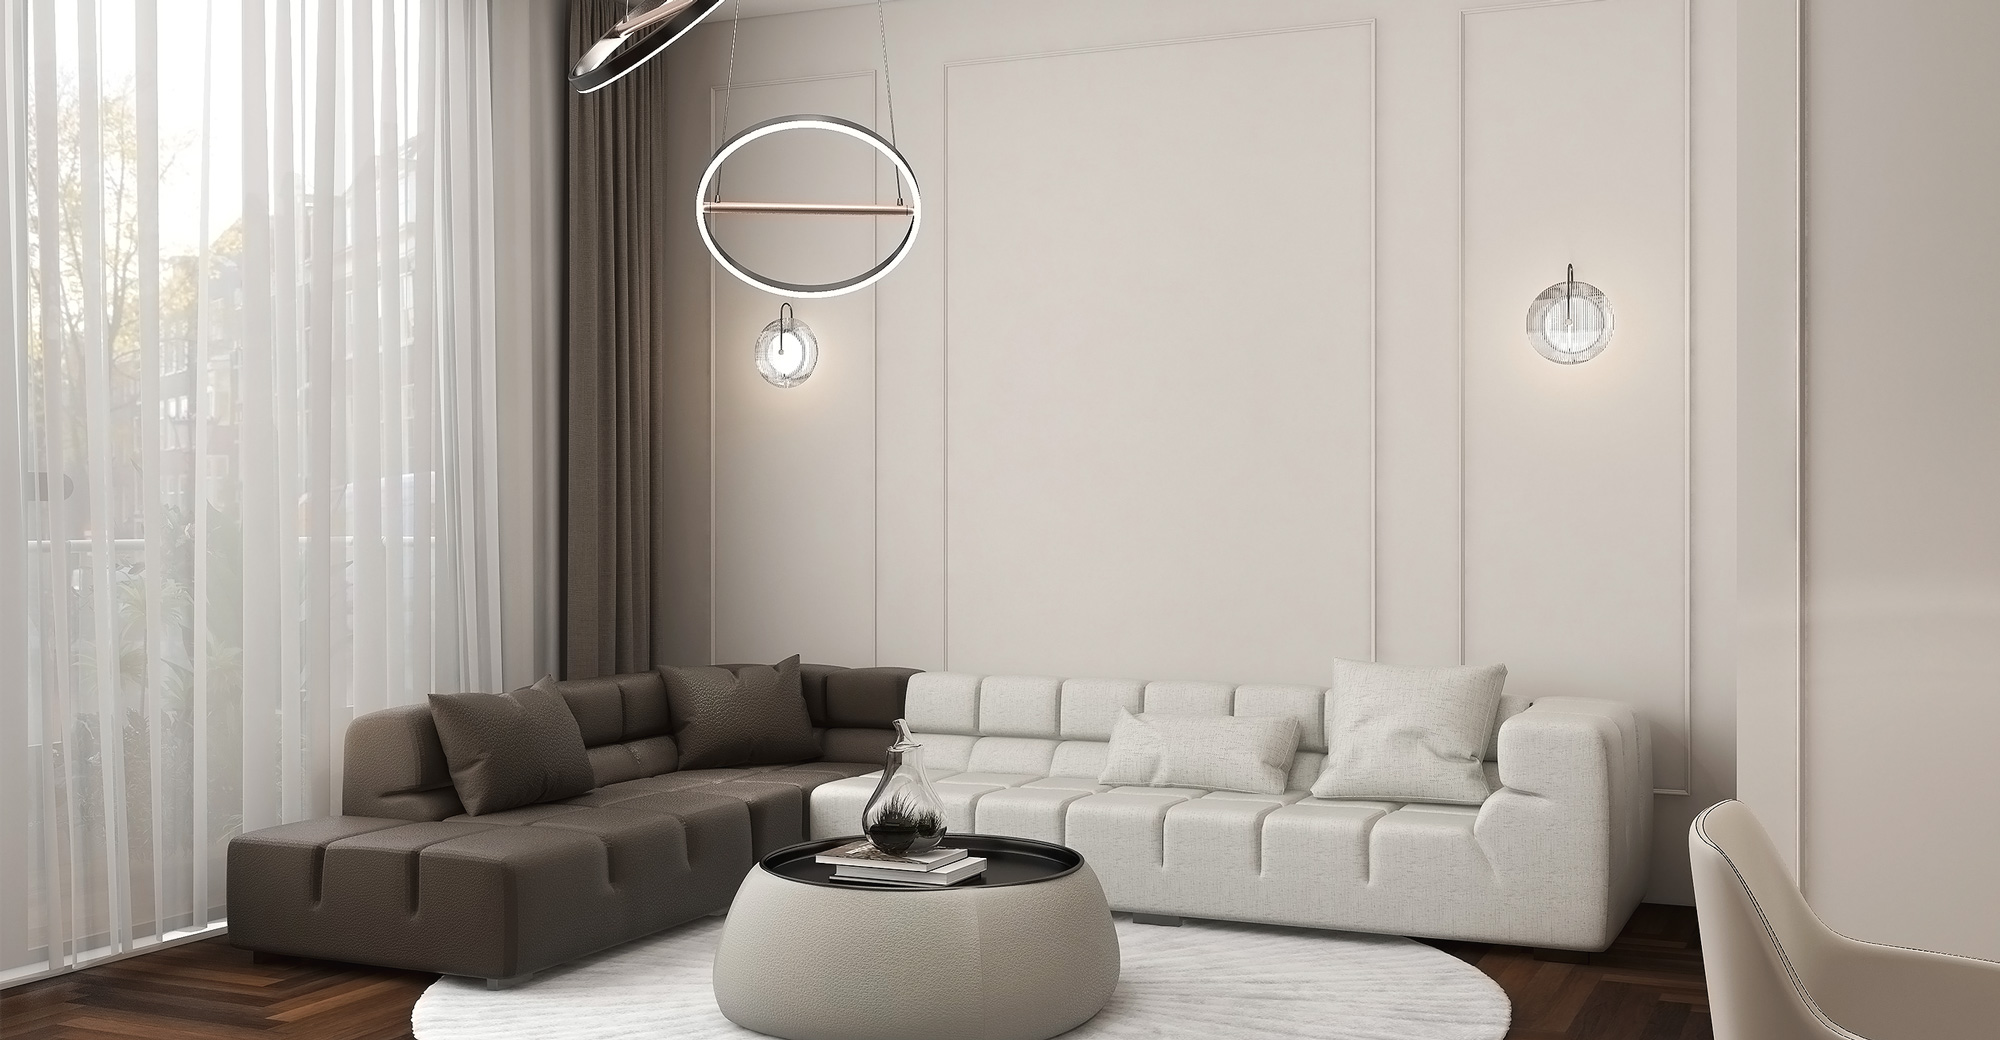 梧棲 台中 室內設計 狀況 住宅 客廳 interior design taichung taiwan 台灣 Wuqi residential living room